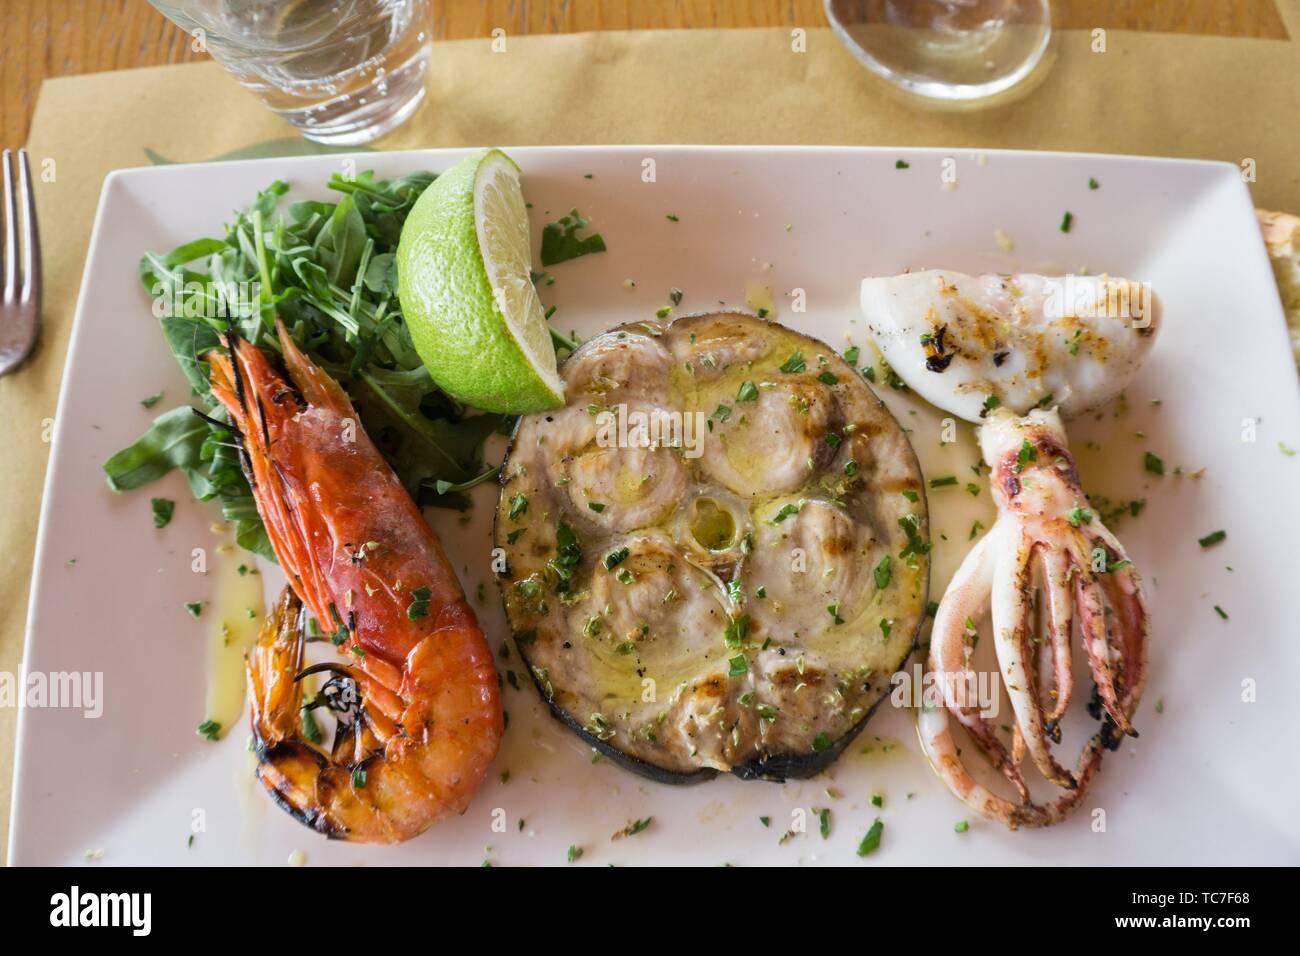 Mixed grill fish food Sicily Italy. - Stock Image